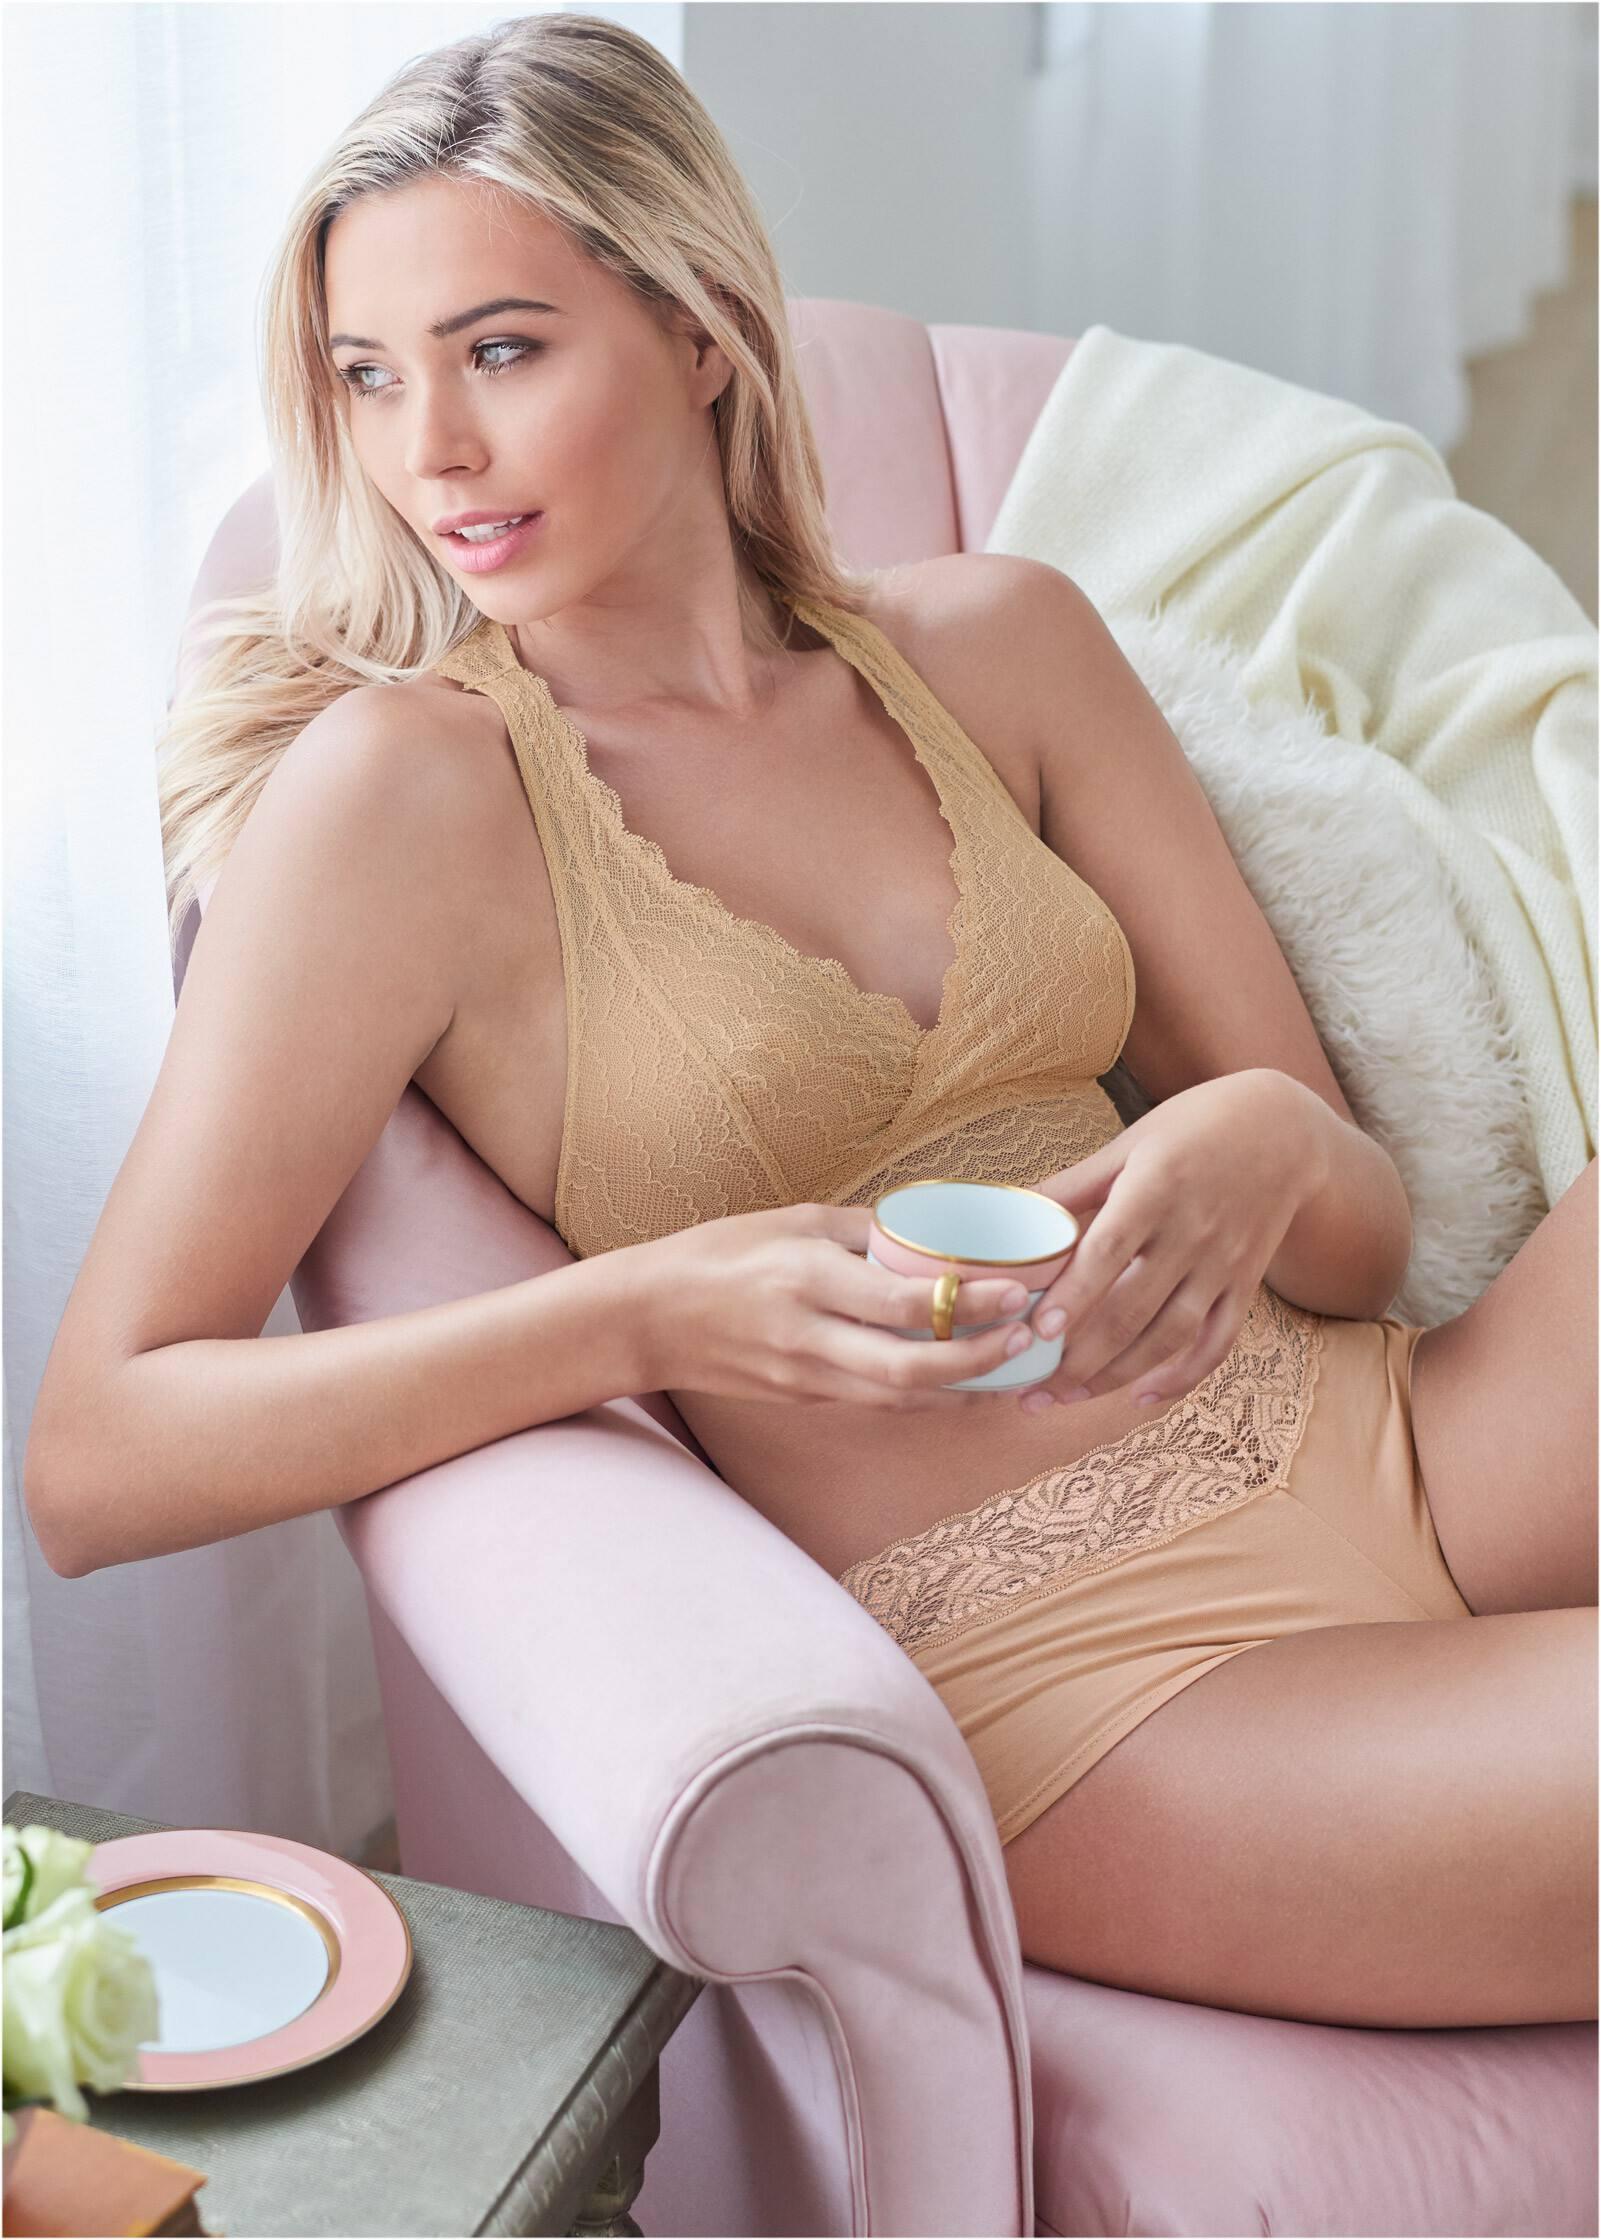 Sandra Kubicka Sexy Lingerie